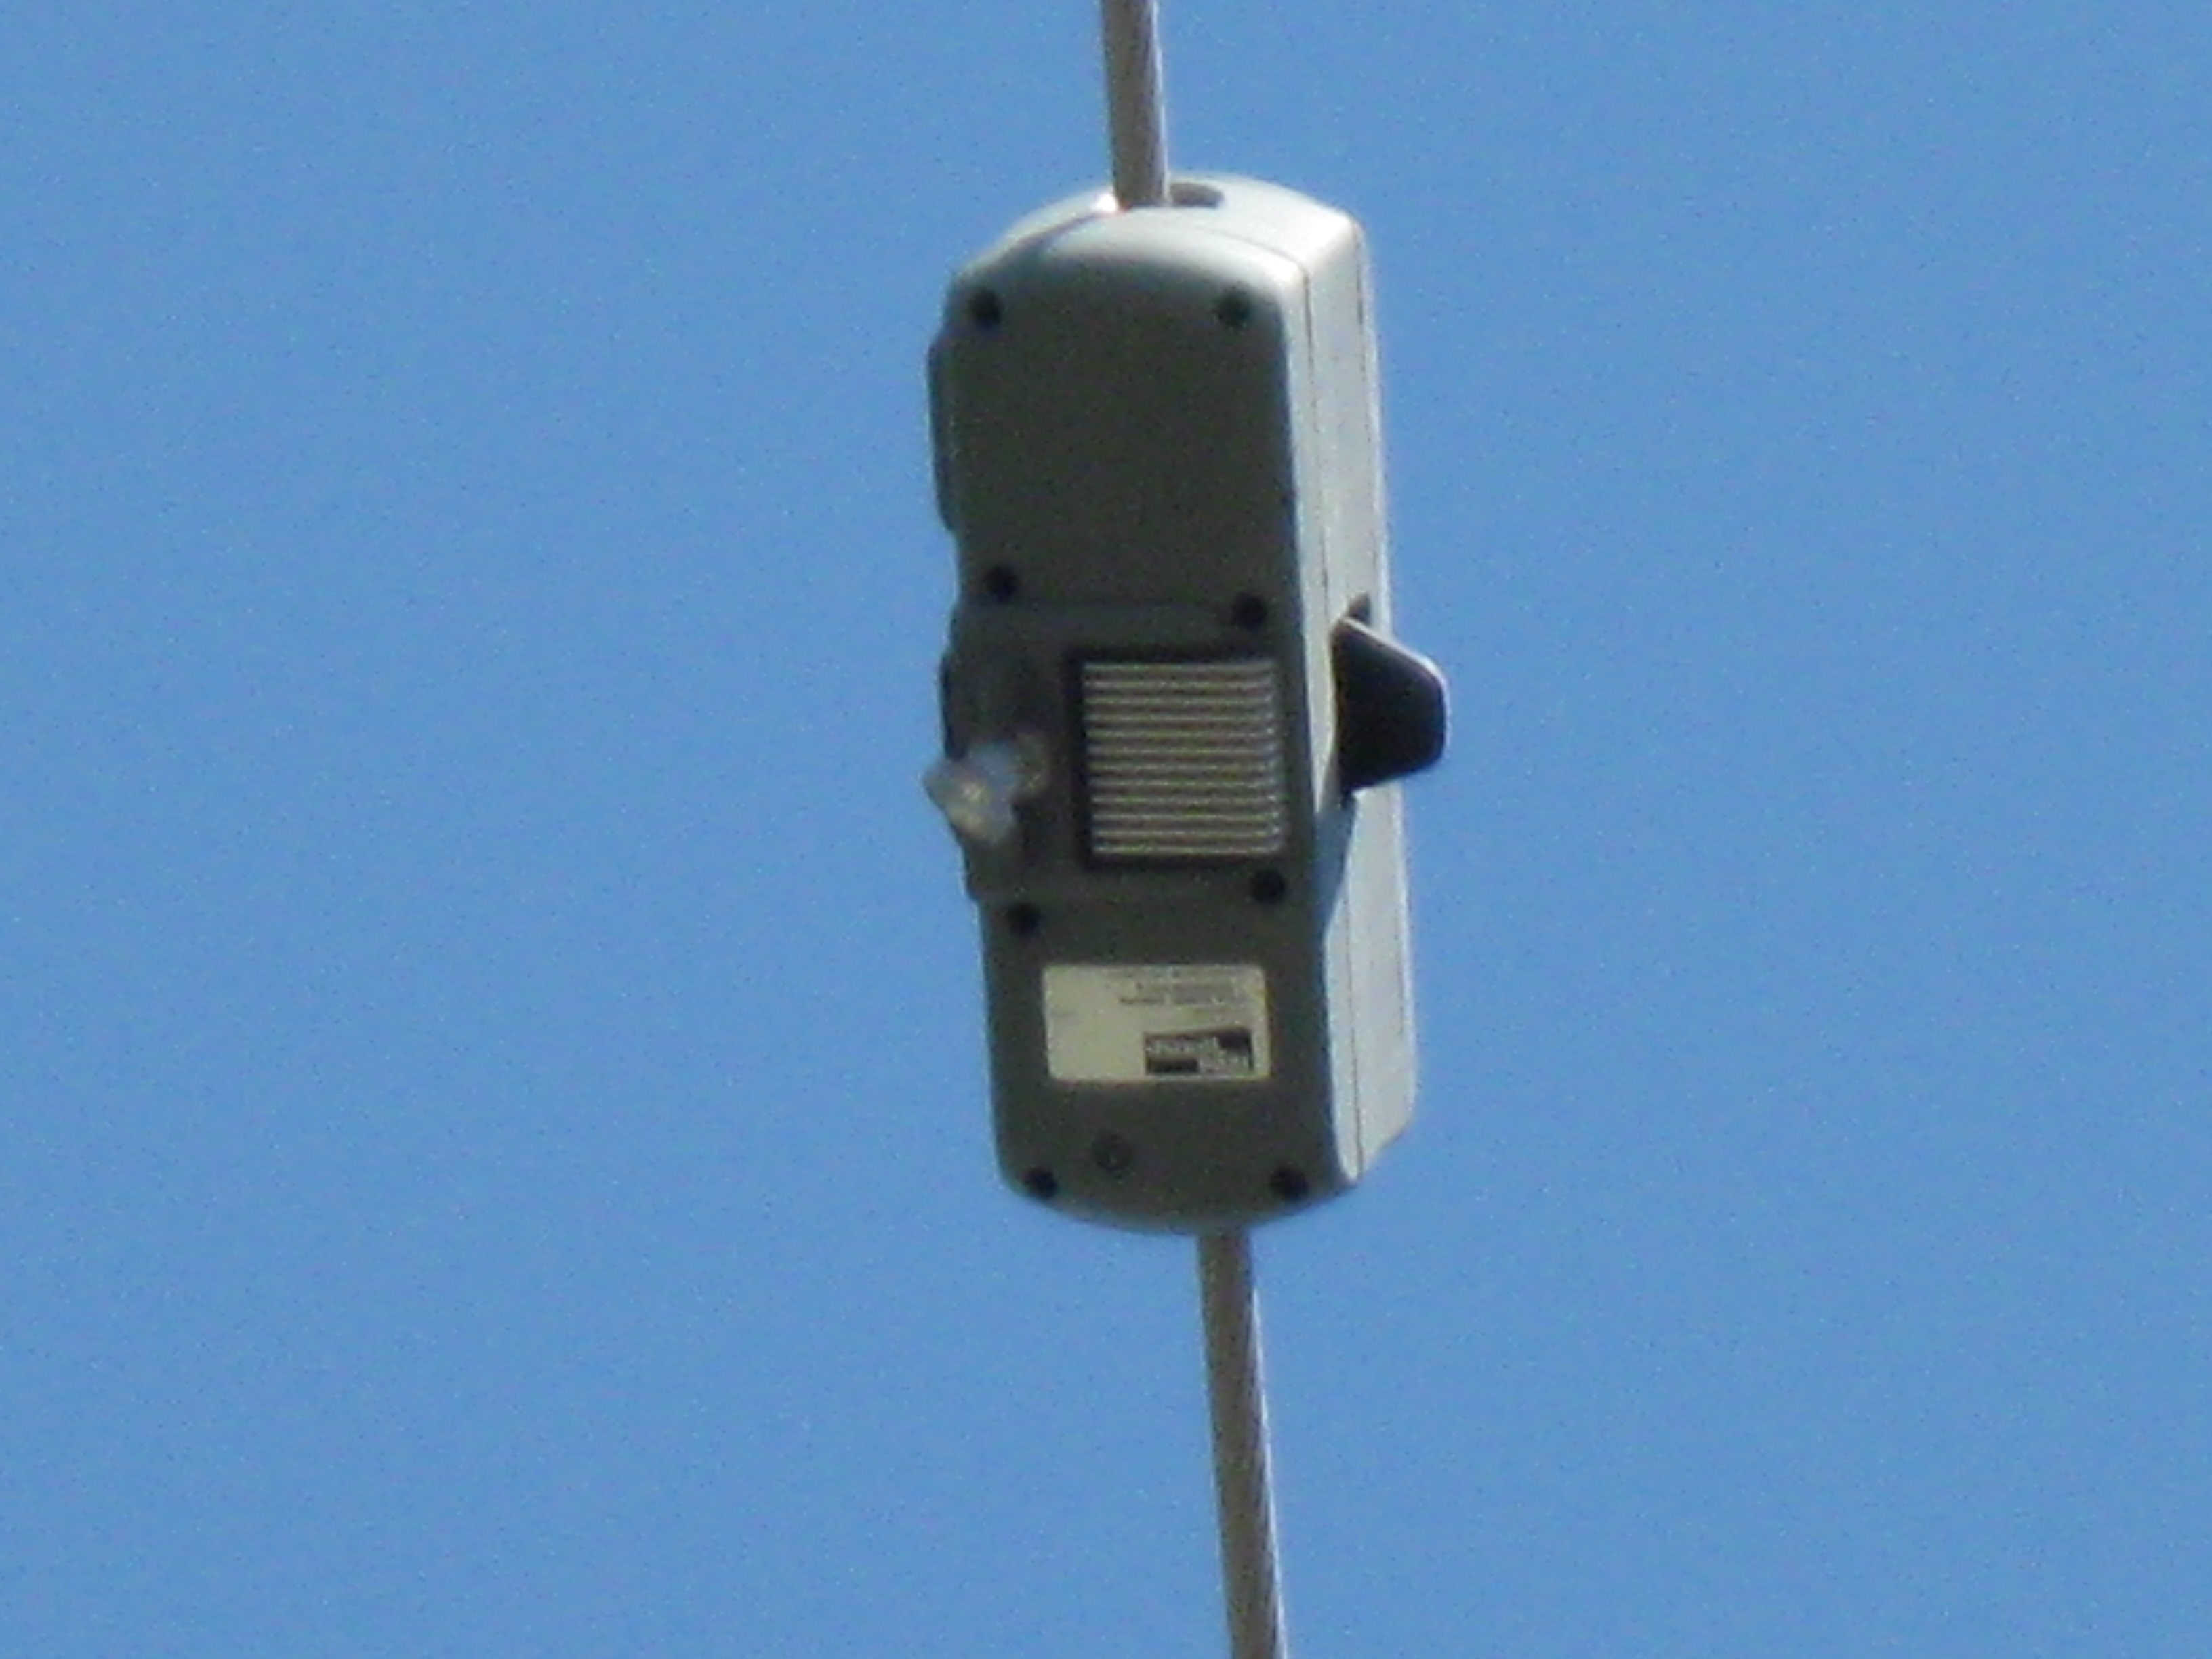 wirelesspowerline sensor.jpg